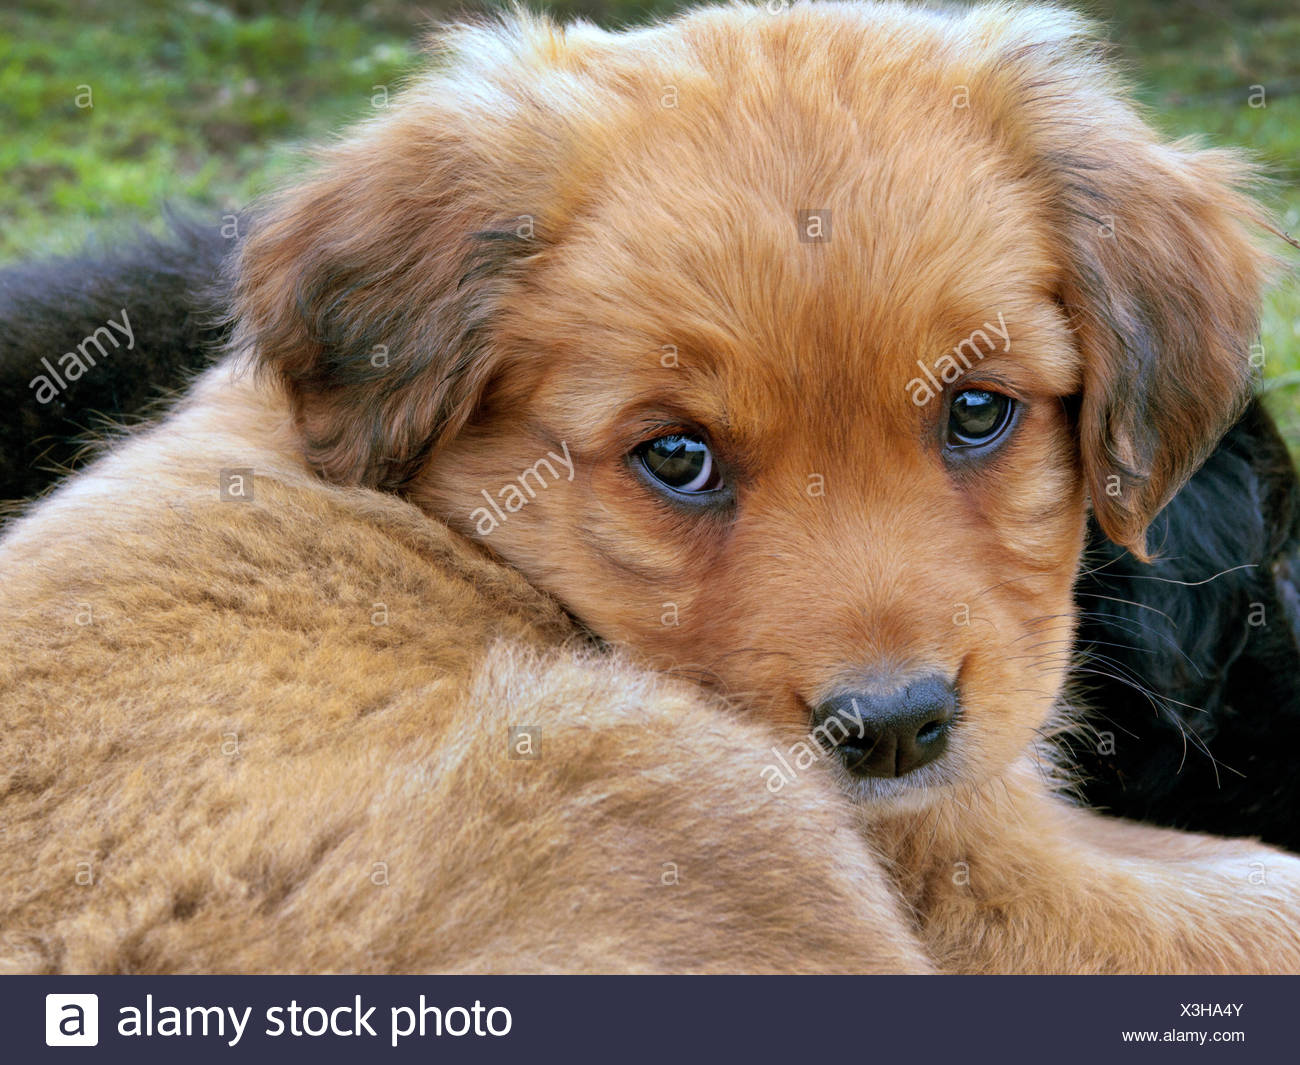 brown, brownish, brunette, puppy, maddening, pert, coquettish, cute, pet, - Stock Image